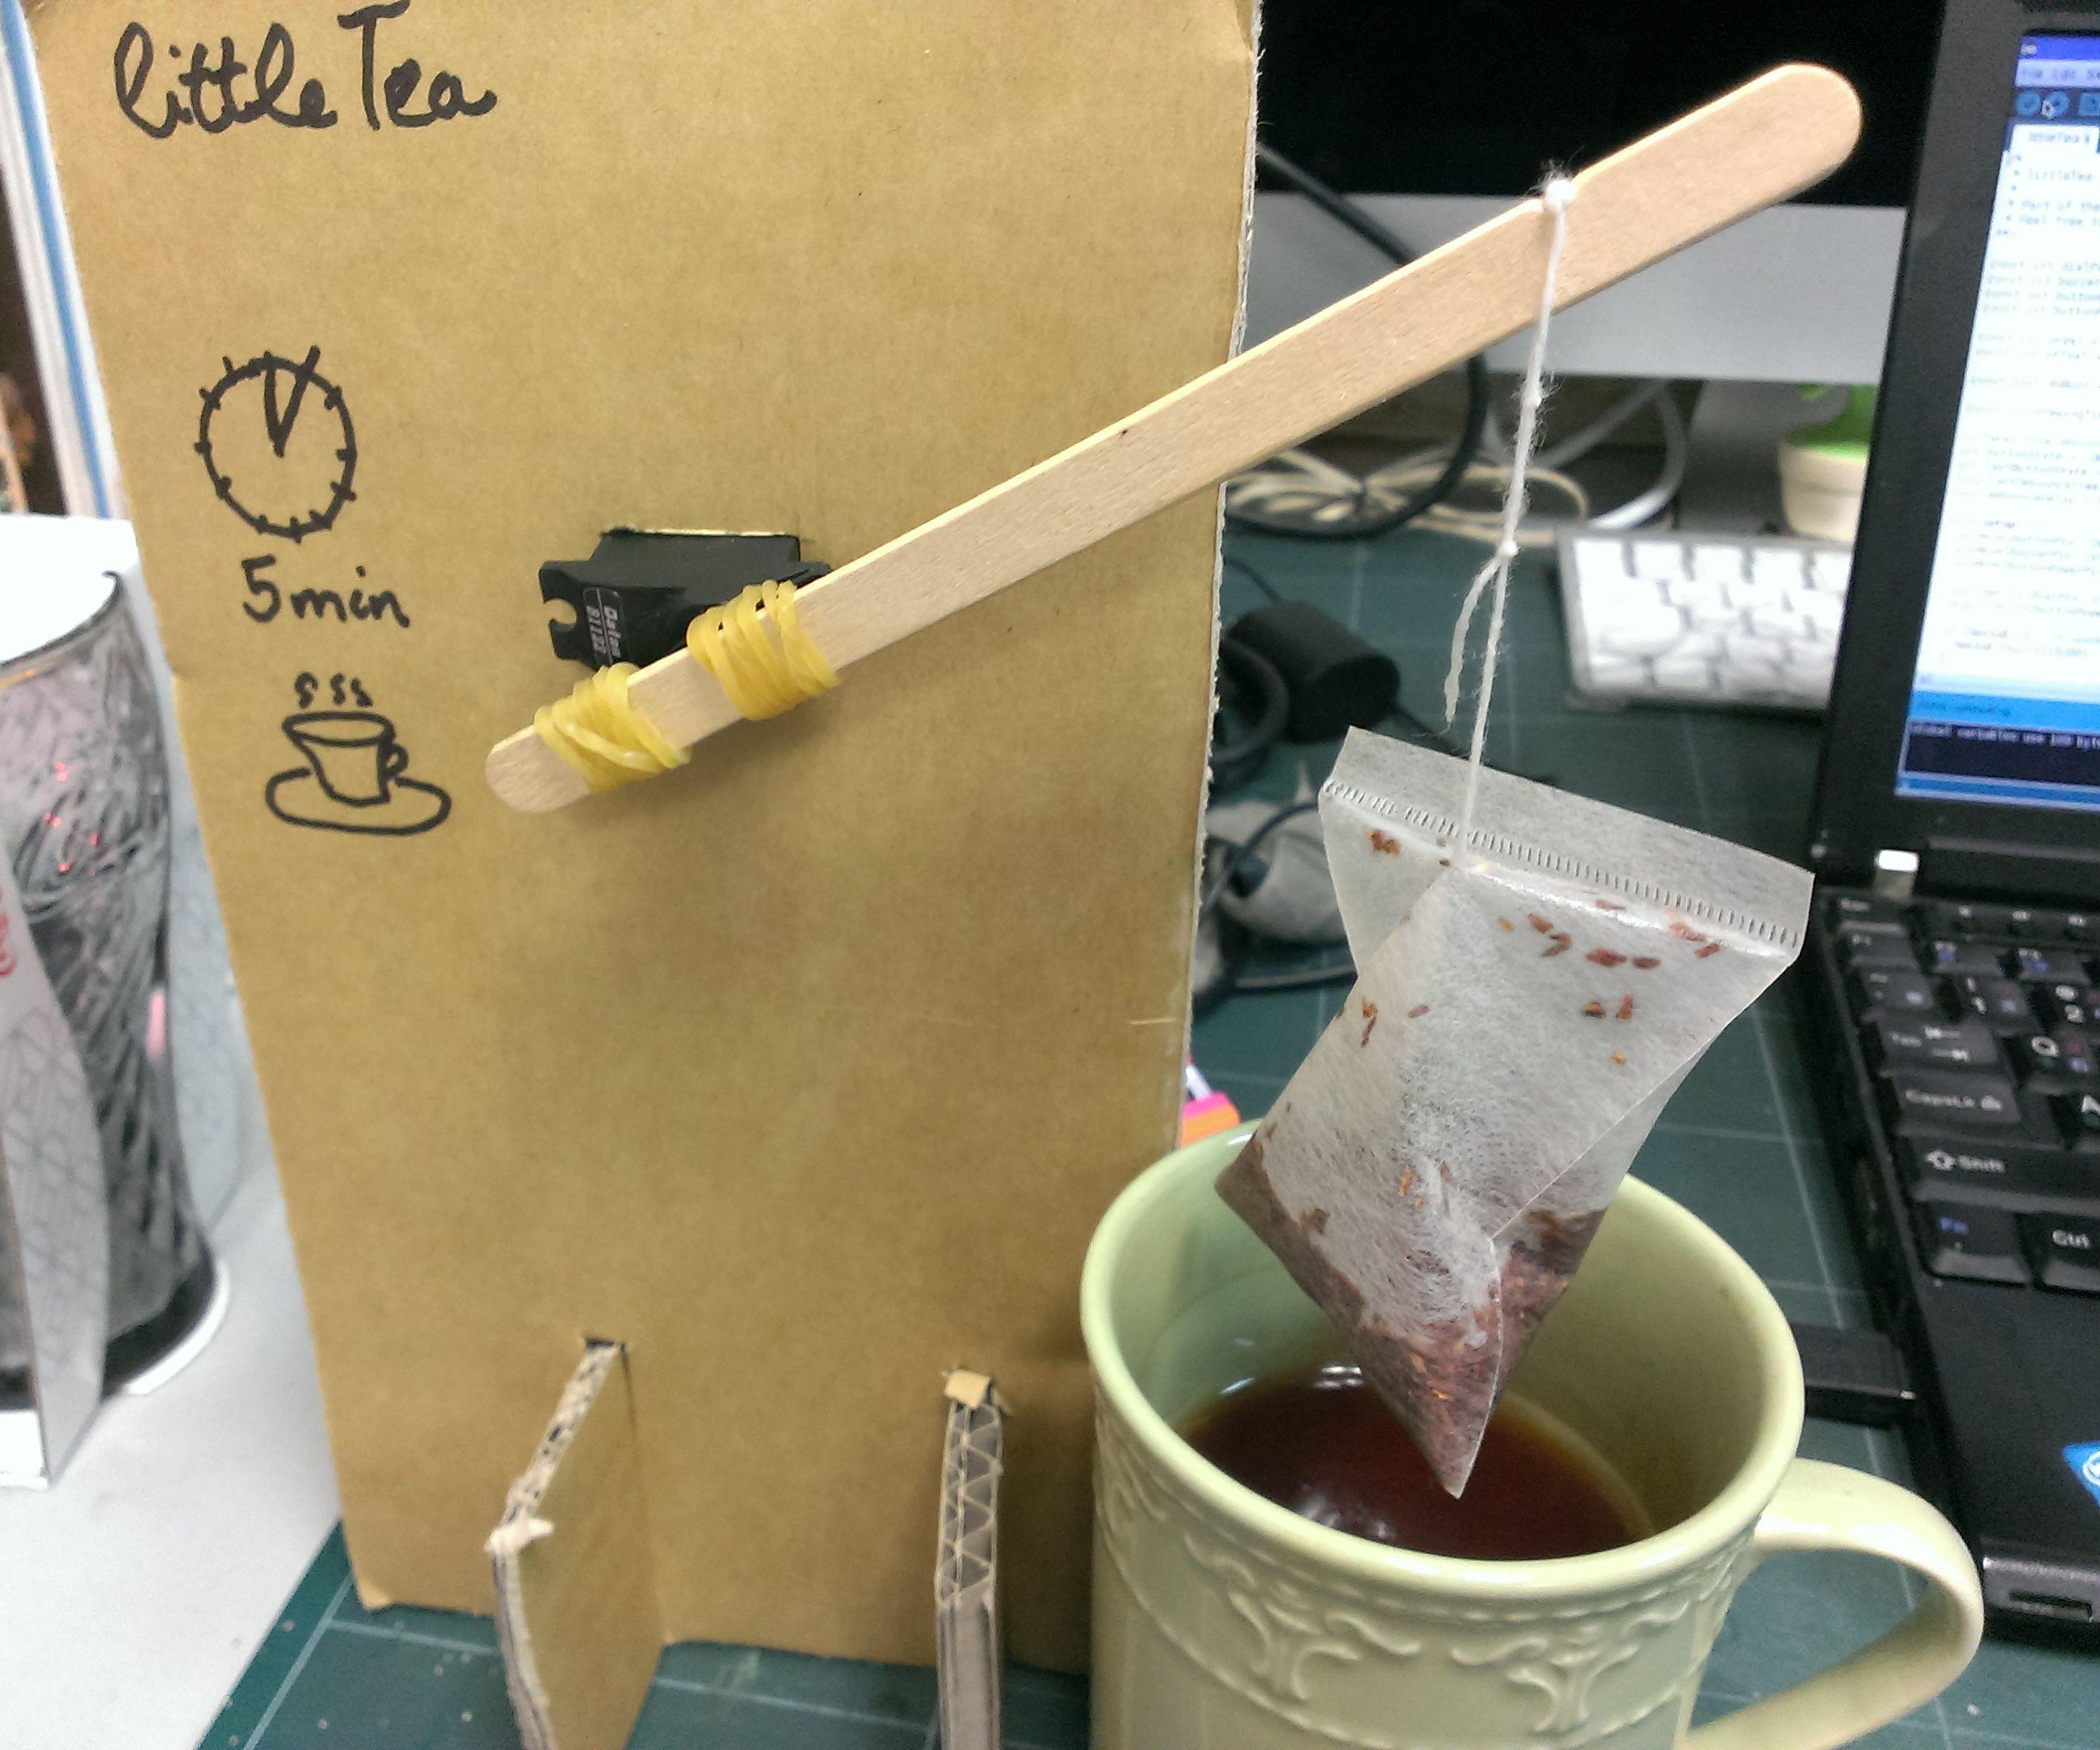 littleTea: robotic tea brewing